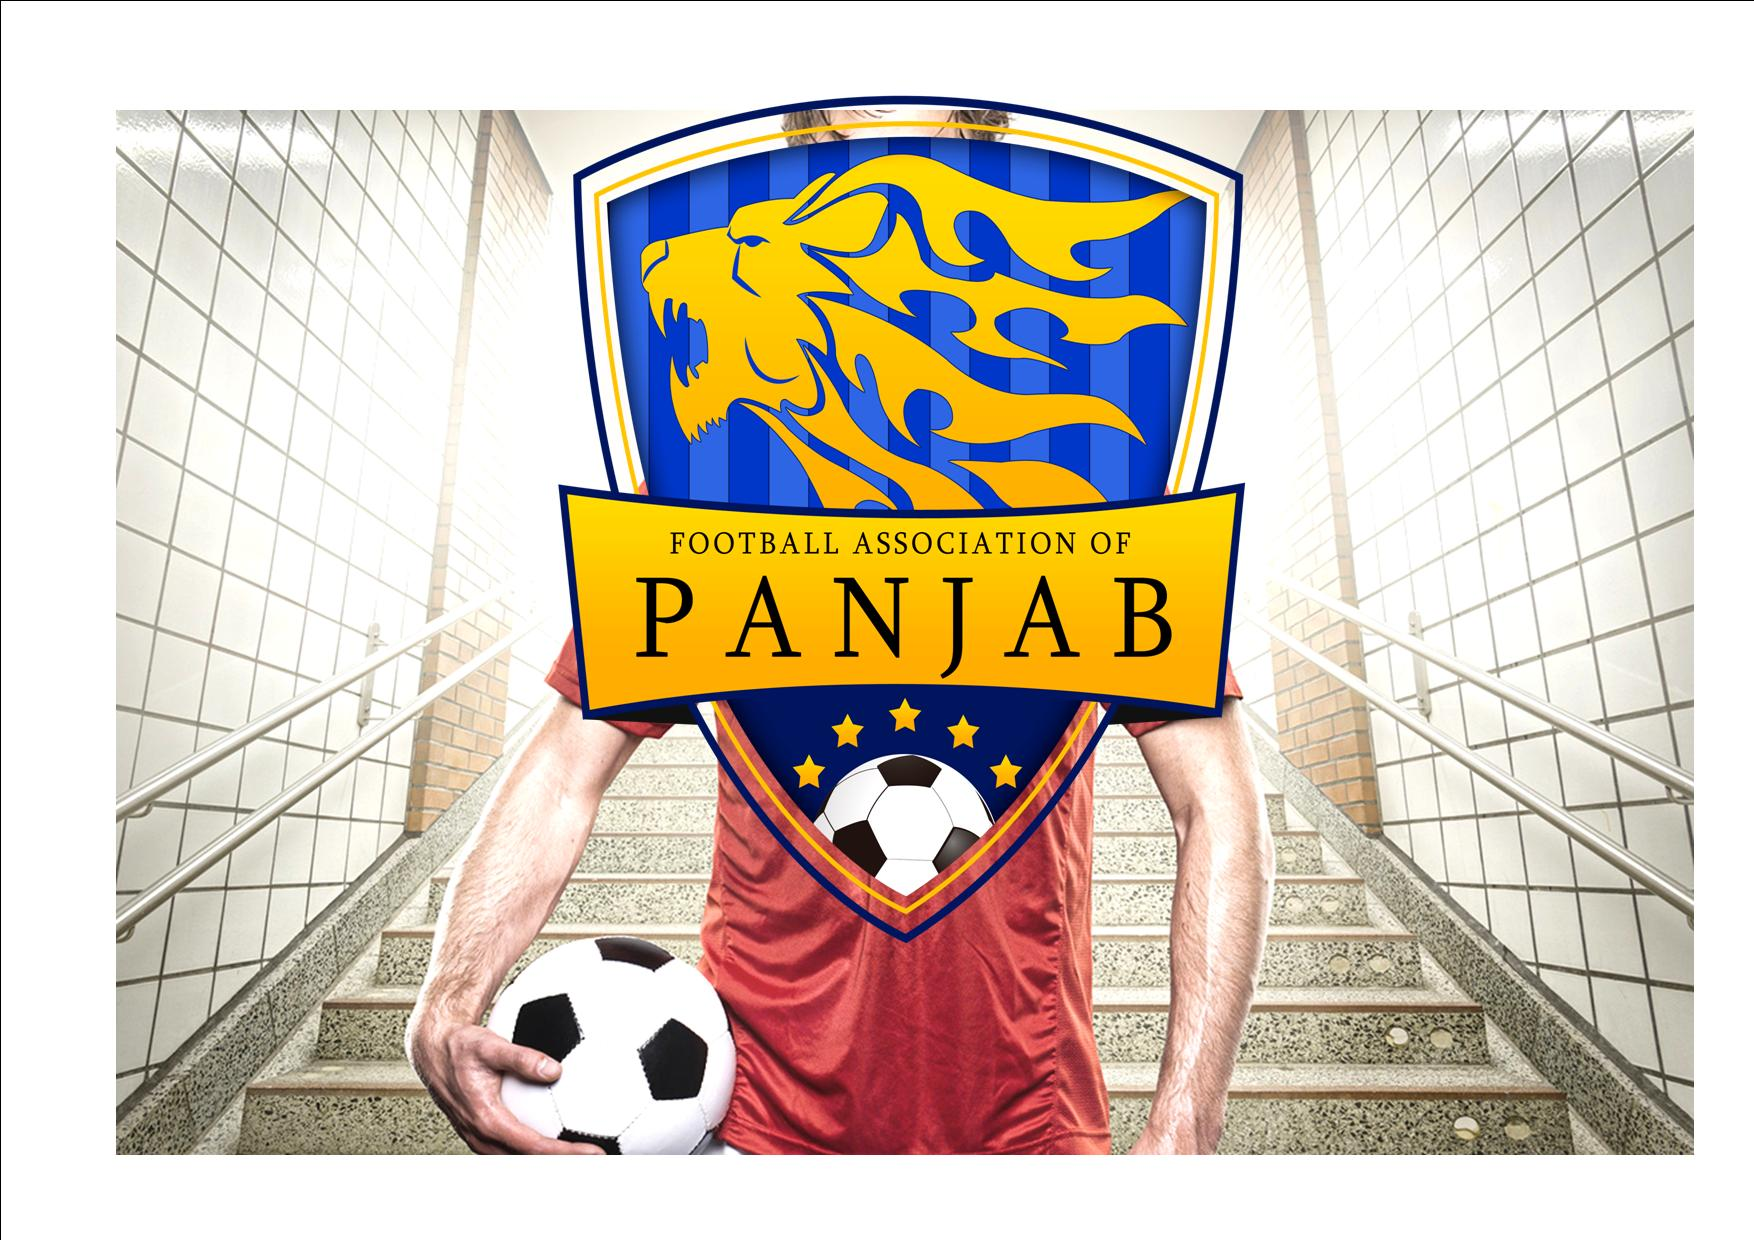 MATCH PREVIEW: Liverpool U23's vs Panjab FA